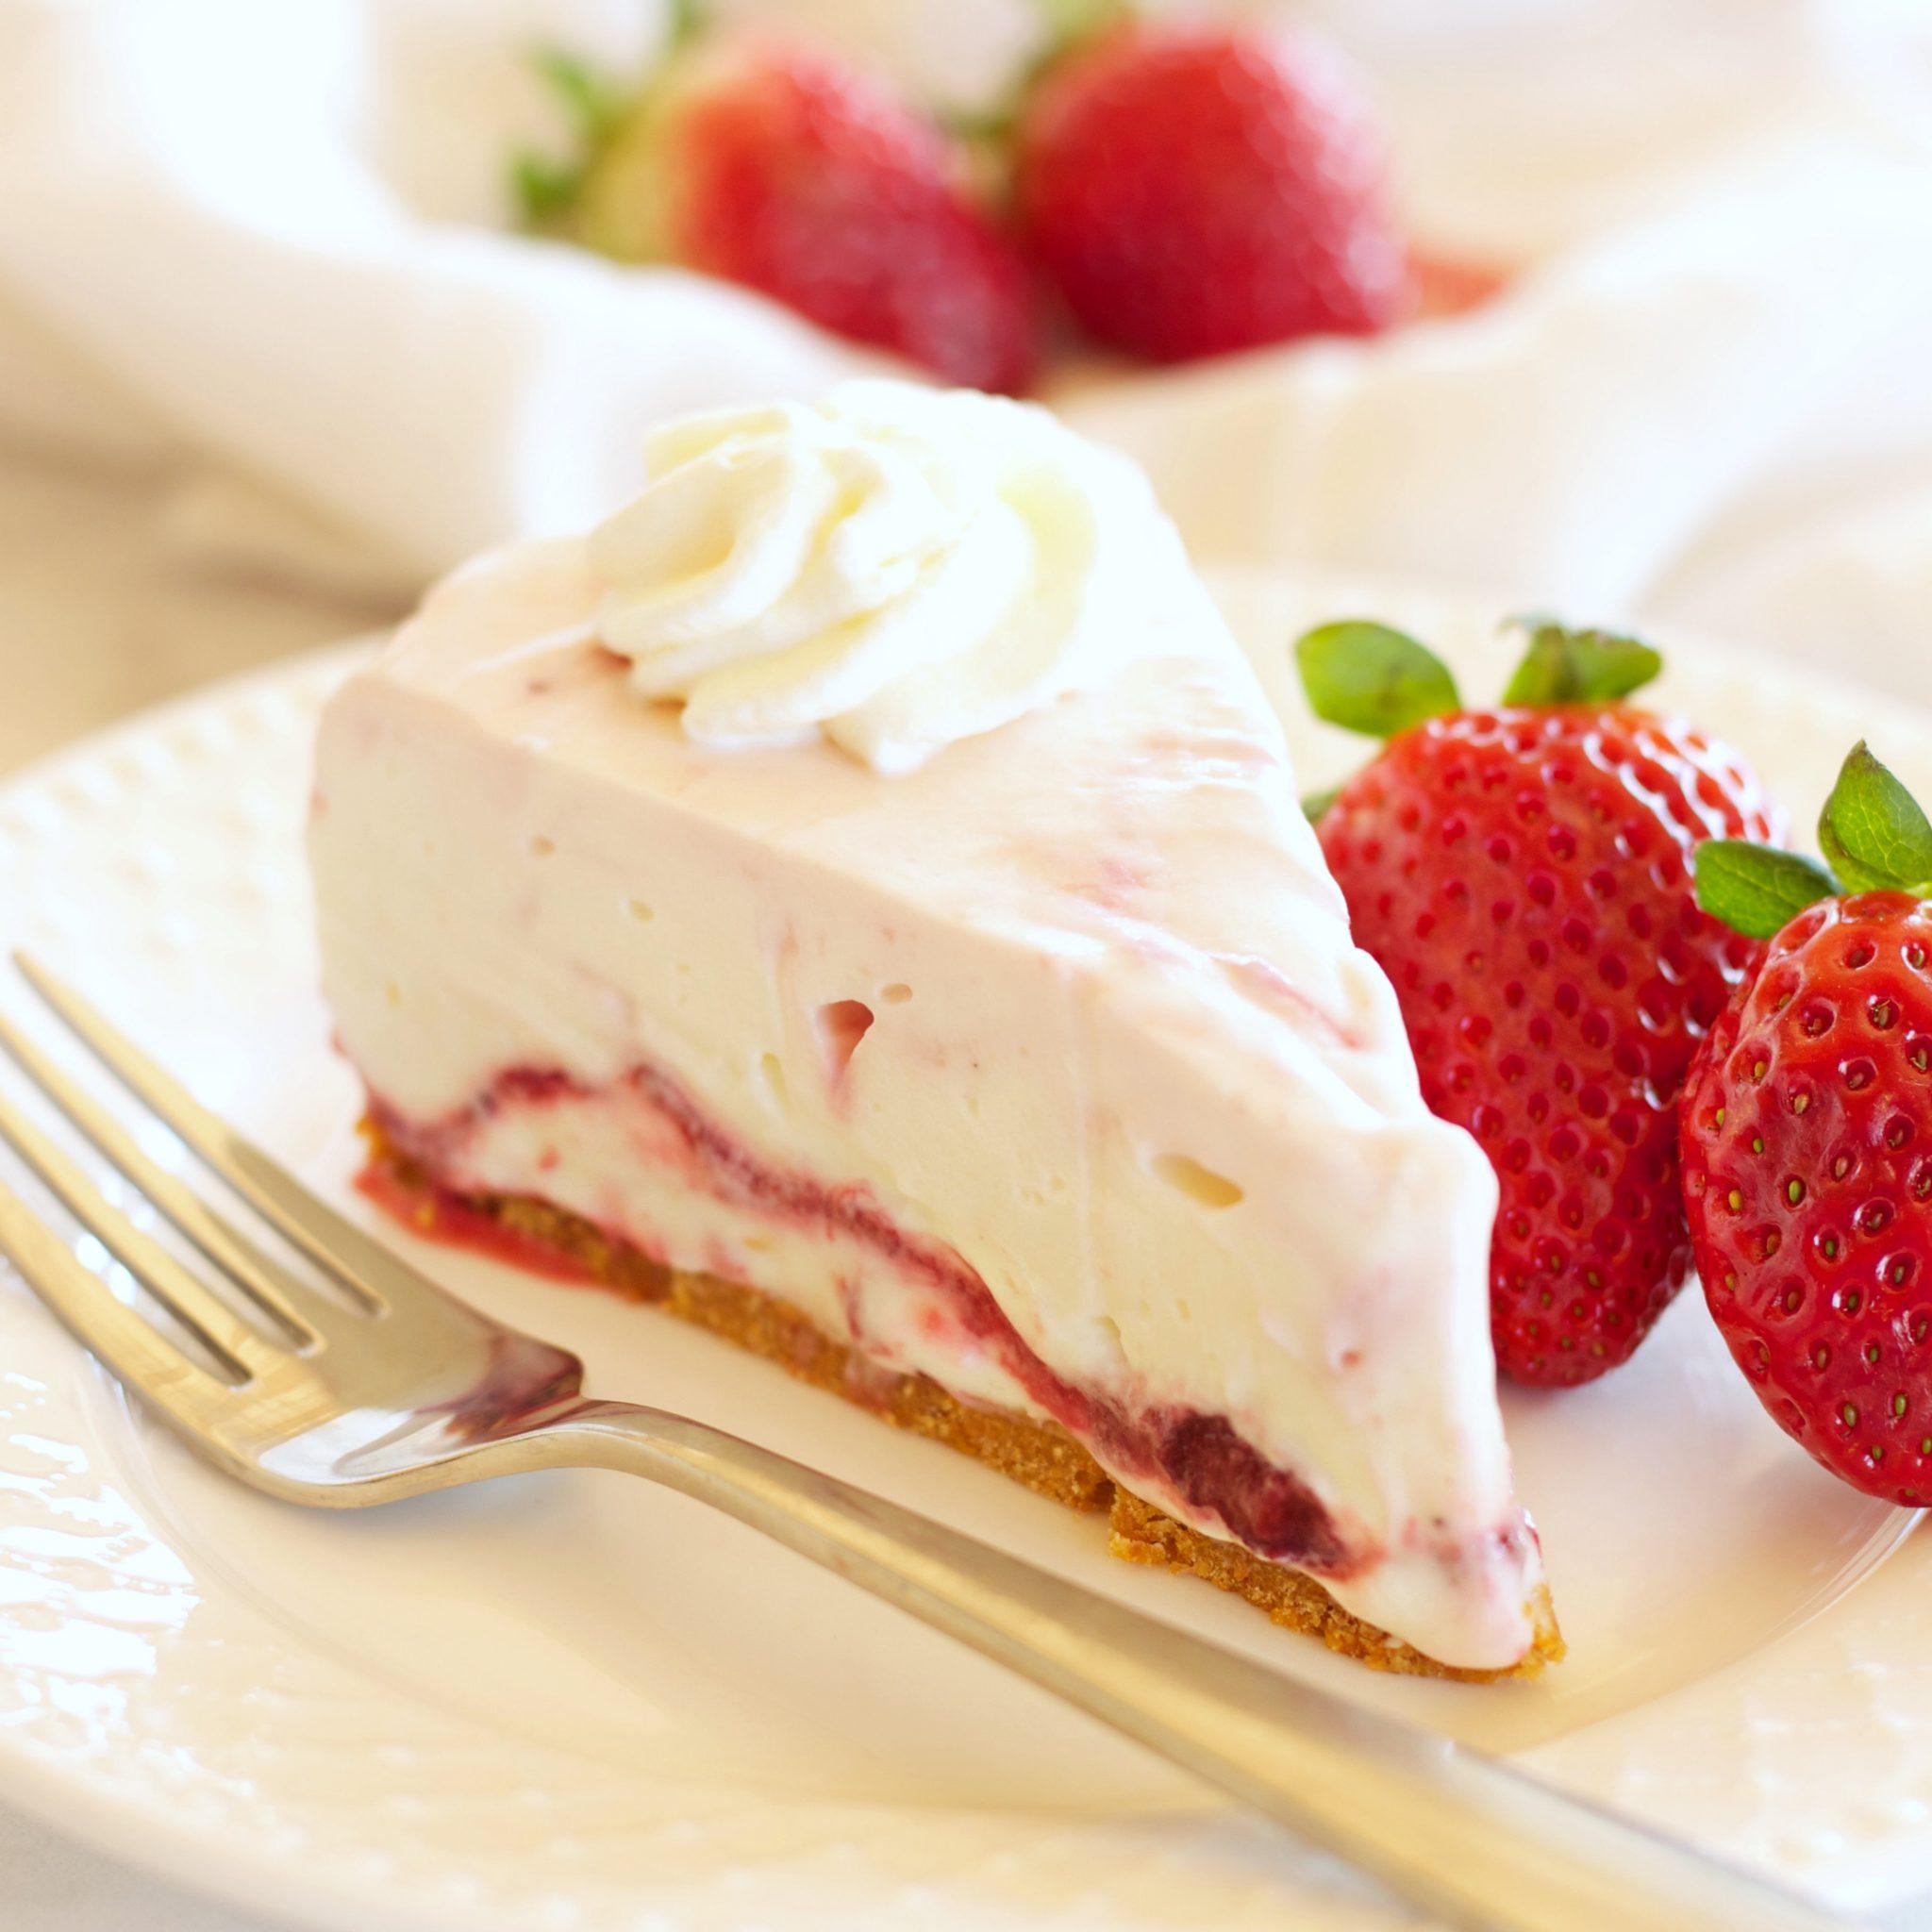 No Bake Orange Creamsicle Cheesecake Easy No Bake Strawberry Swirl Cheesecake